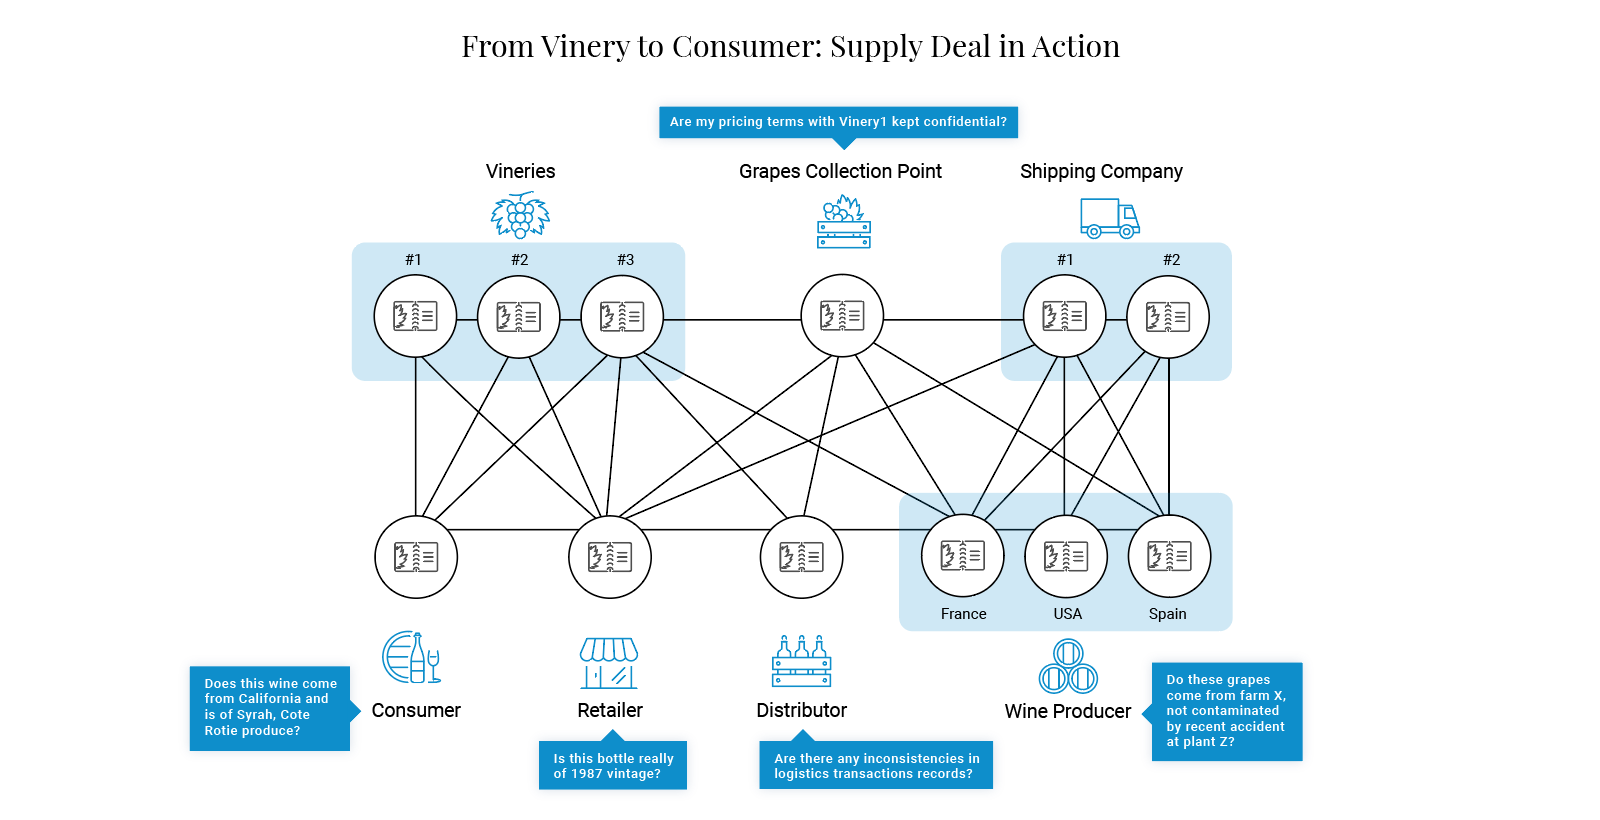 hyperledger supply deal